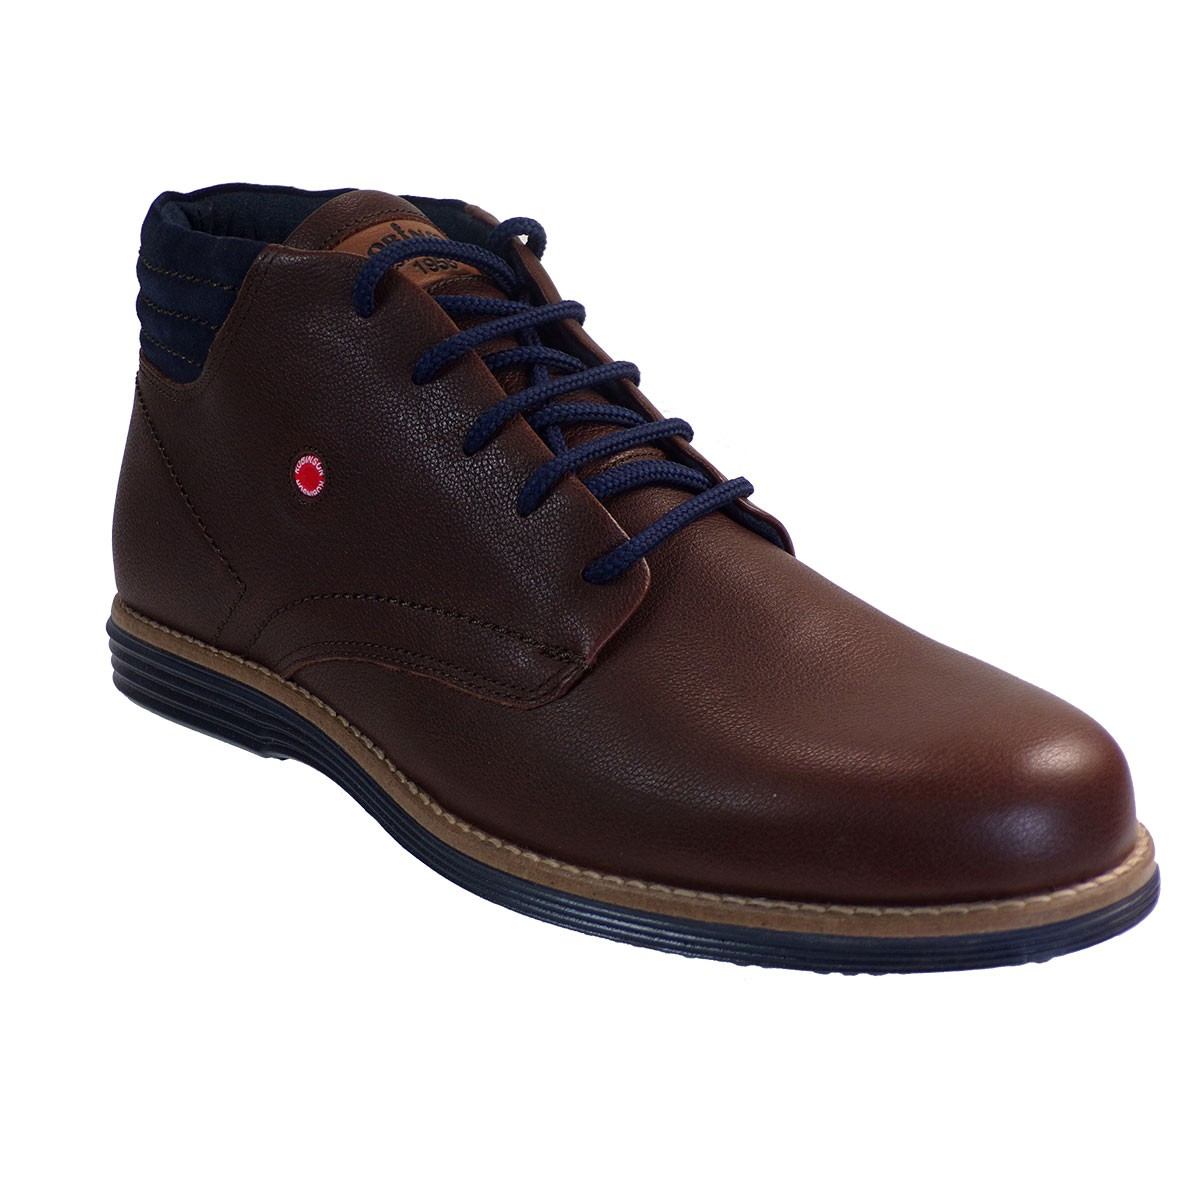 Robinson Ανδρικά Παπούτσια Μποτάκια 2091 Καφέ Δέρμα